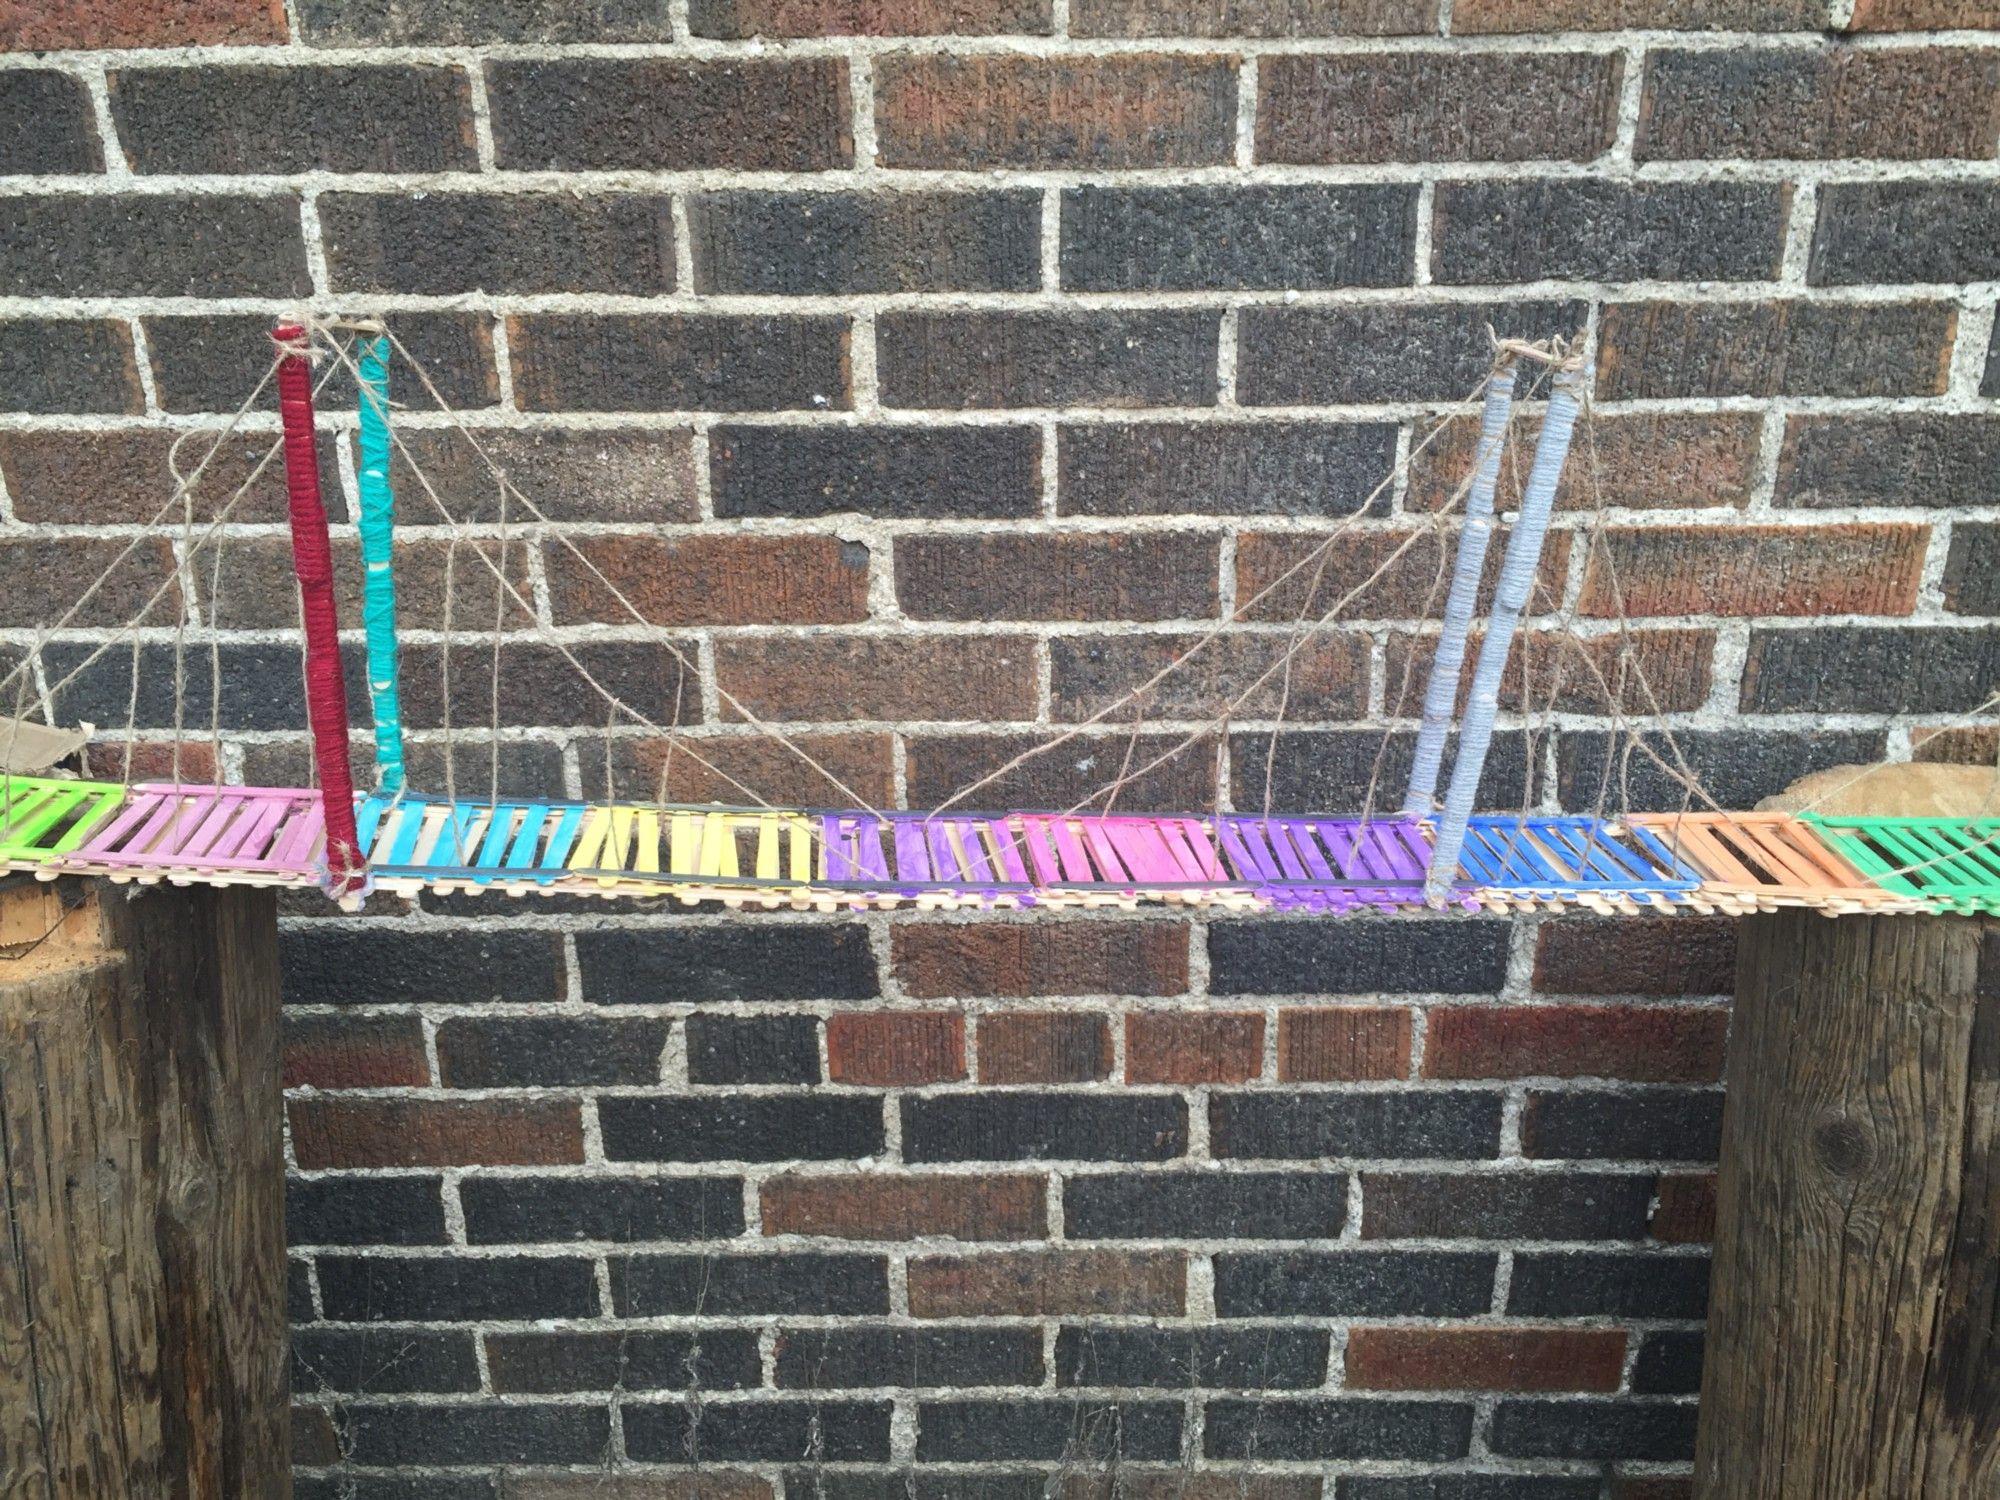 Image result for popsicle stick suspension bridge designs